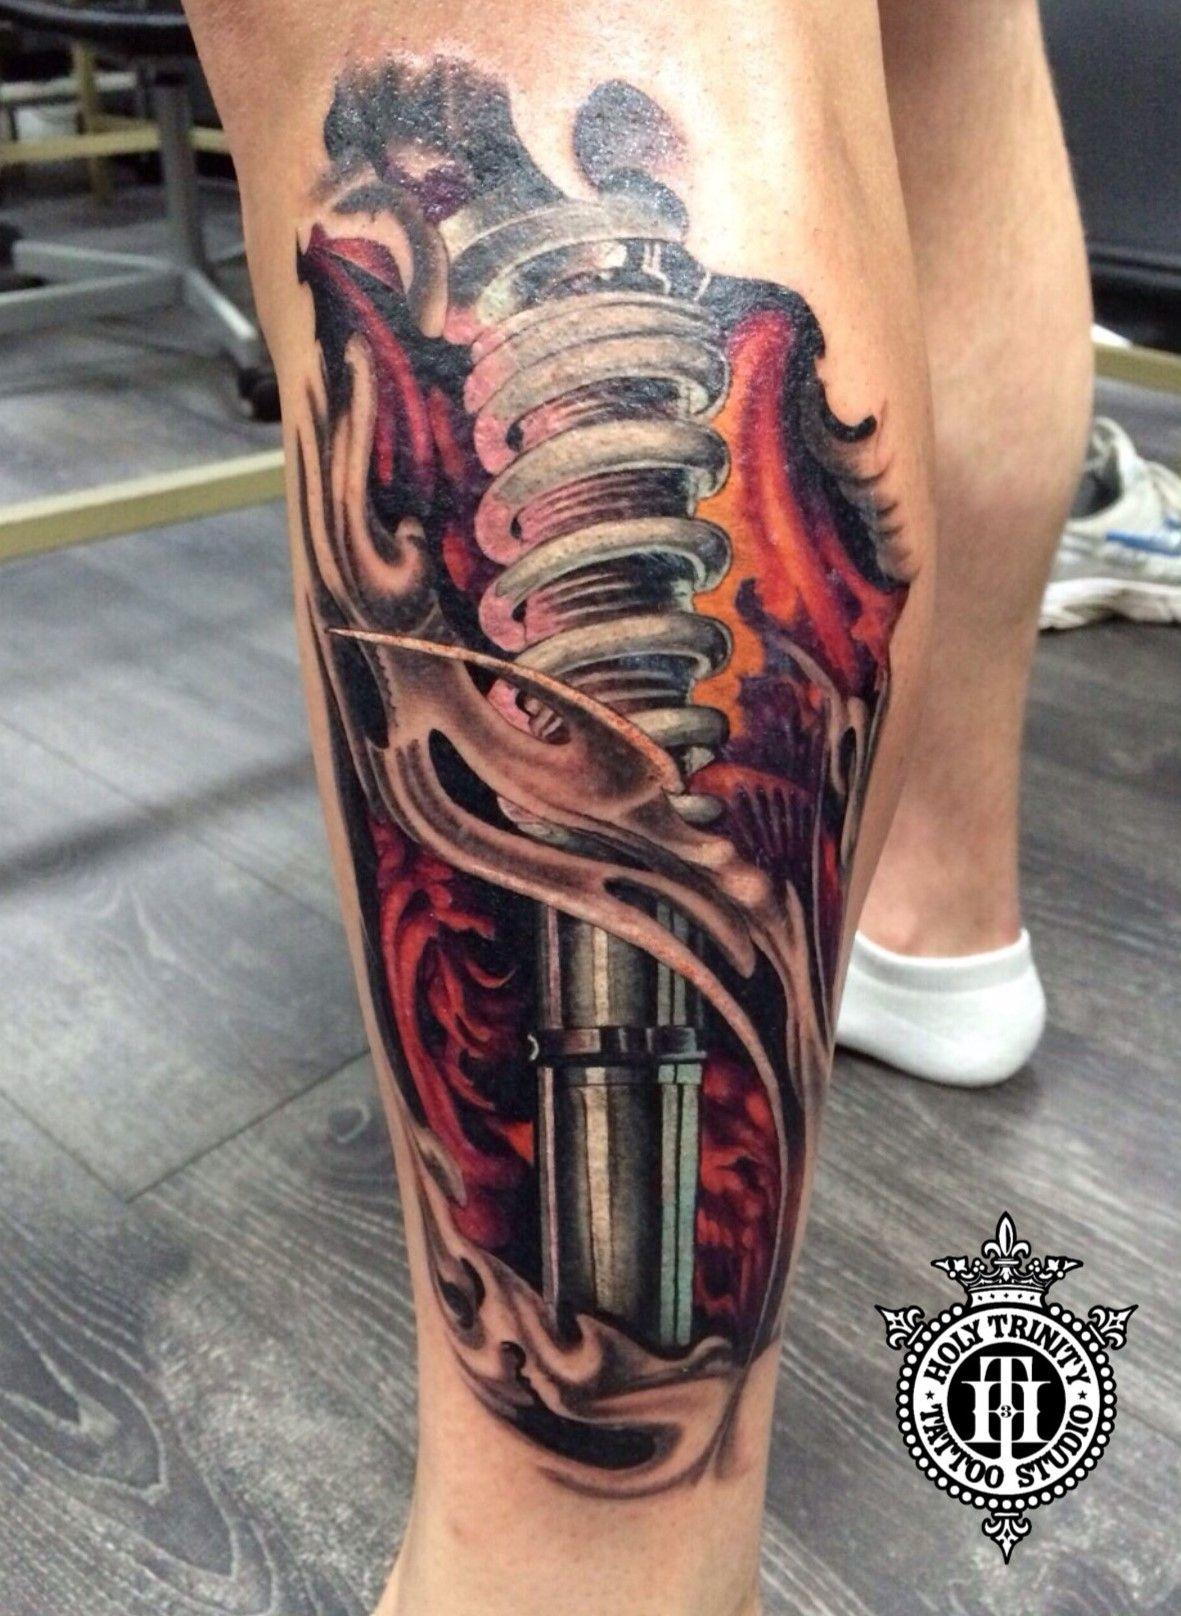 Tattoo gear tattoo sleeve mechanic tattoo mechanical tattoo gears - Fantastic Biomechanical Leg Piece Tattooed In The Studio By Cosmo